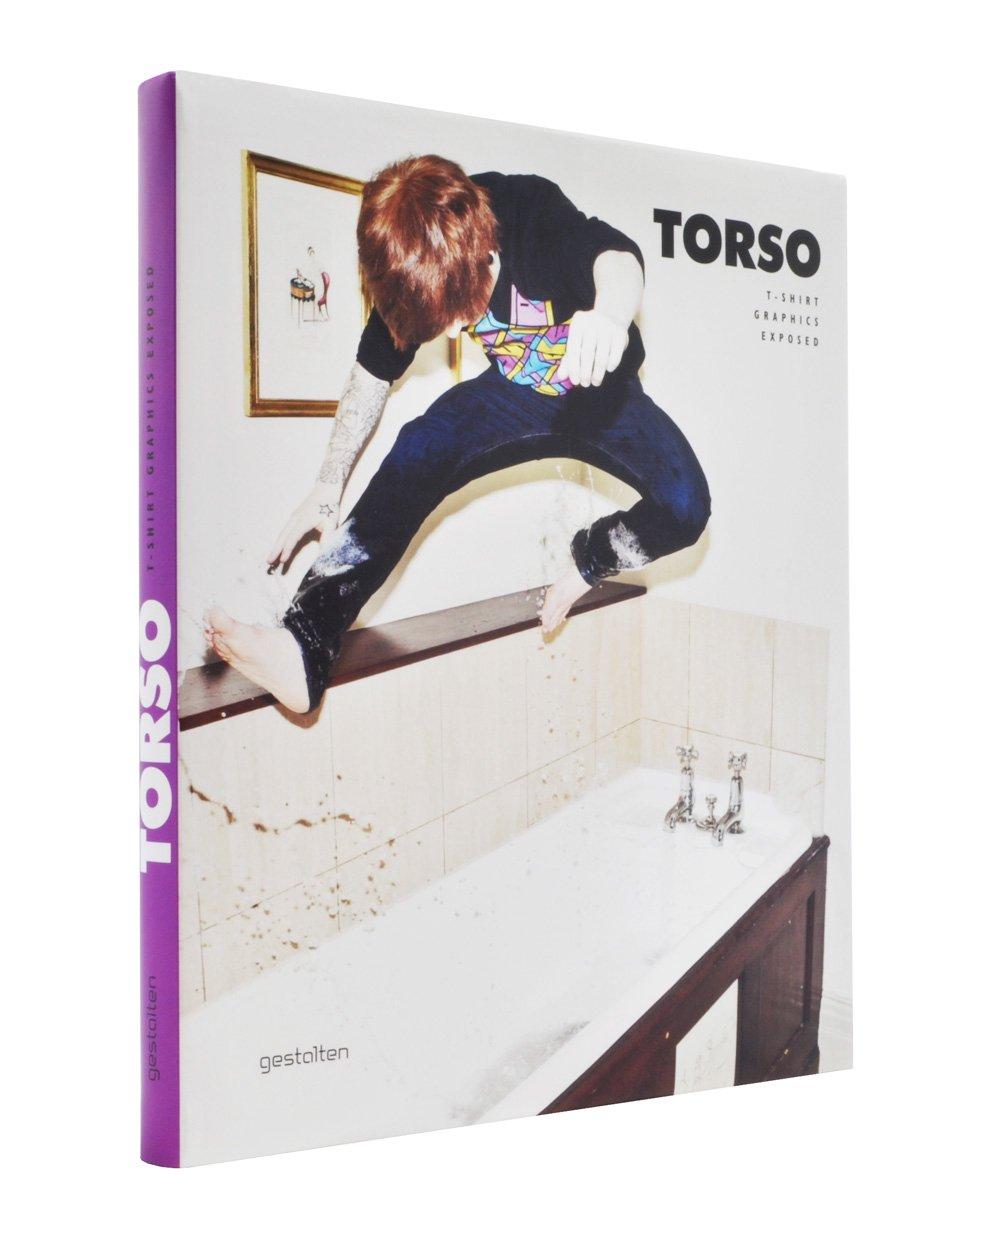 Download Torso: Streetwear T-Shirt Graphics Exposed ebook